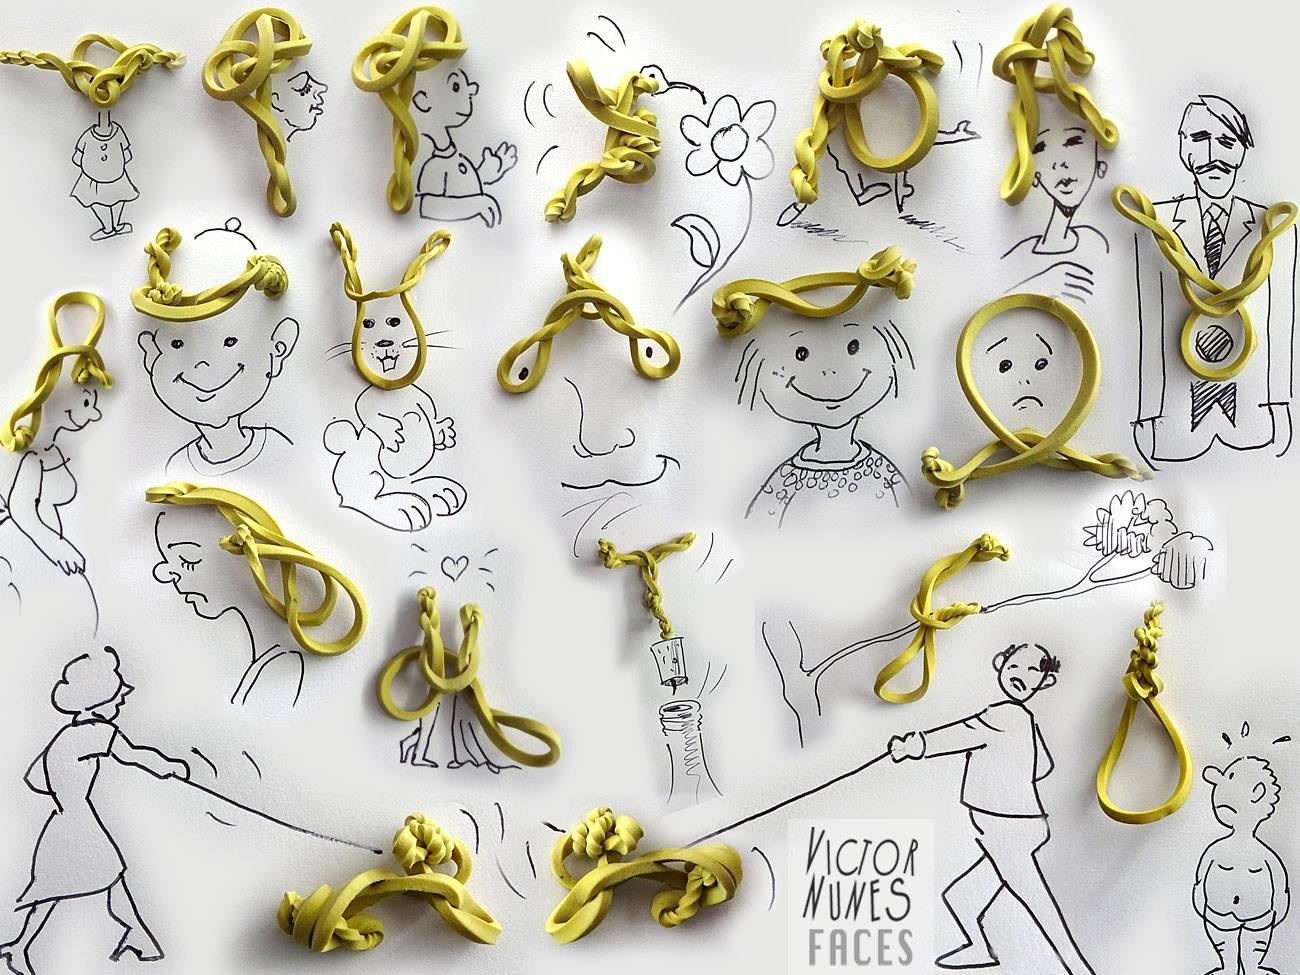 objetos con ilustracion oldskull 11